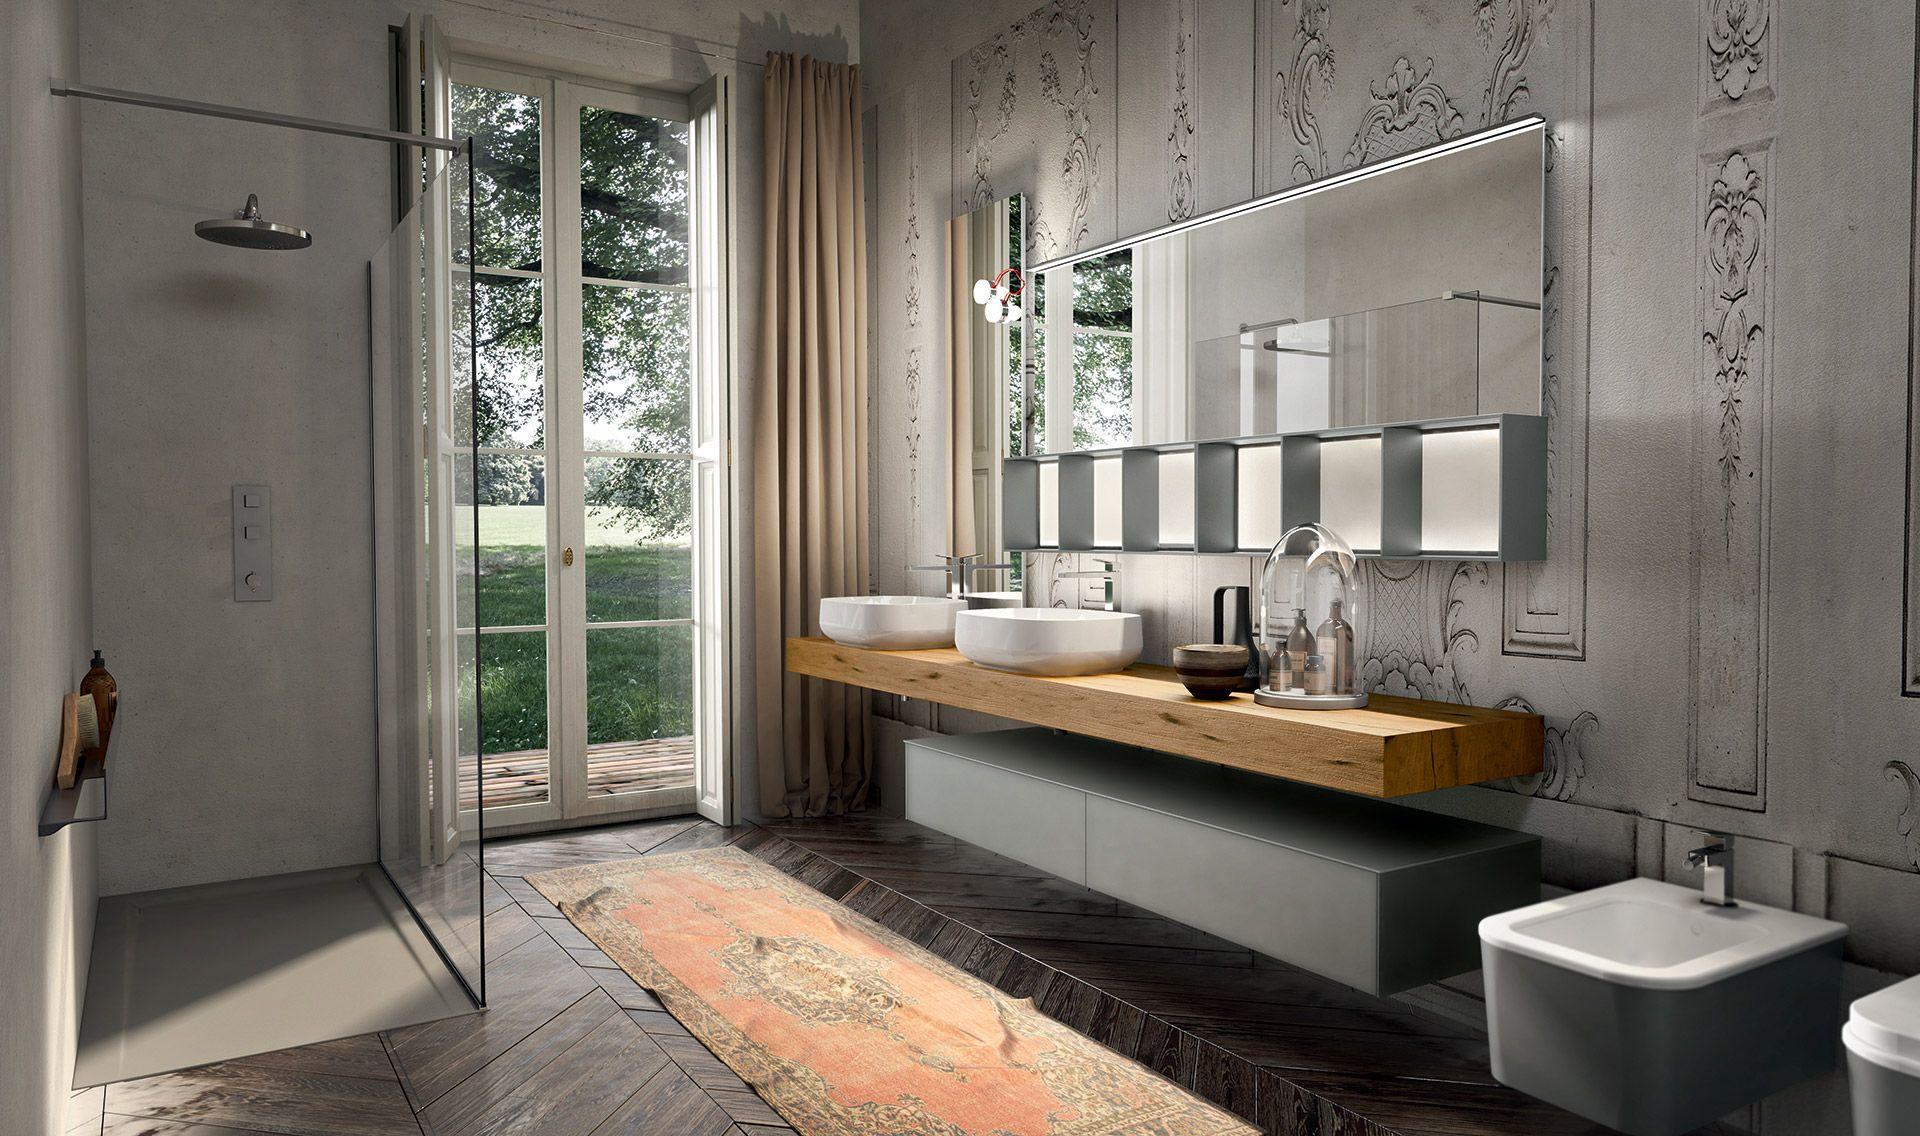 Design Bagno Poggio Piccolo : დაკავშირებული სურათი bathroom nel 2018